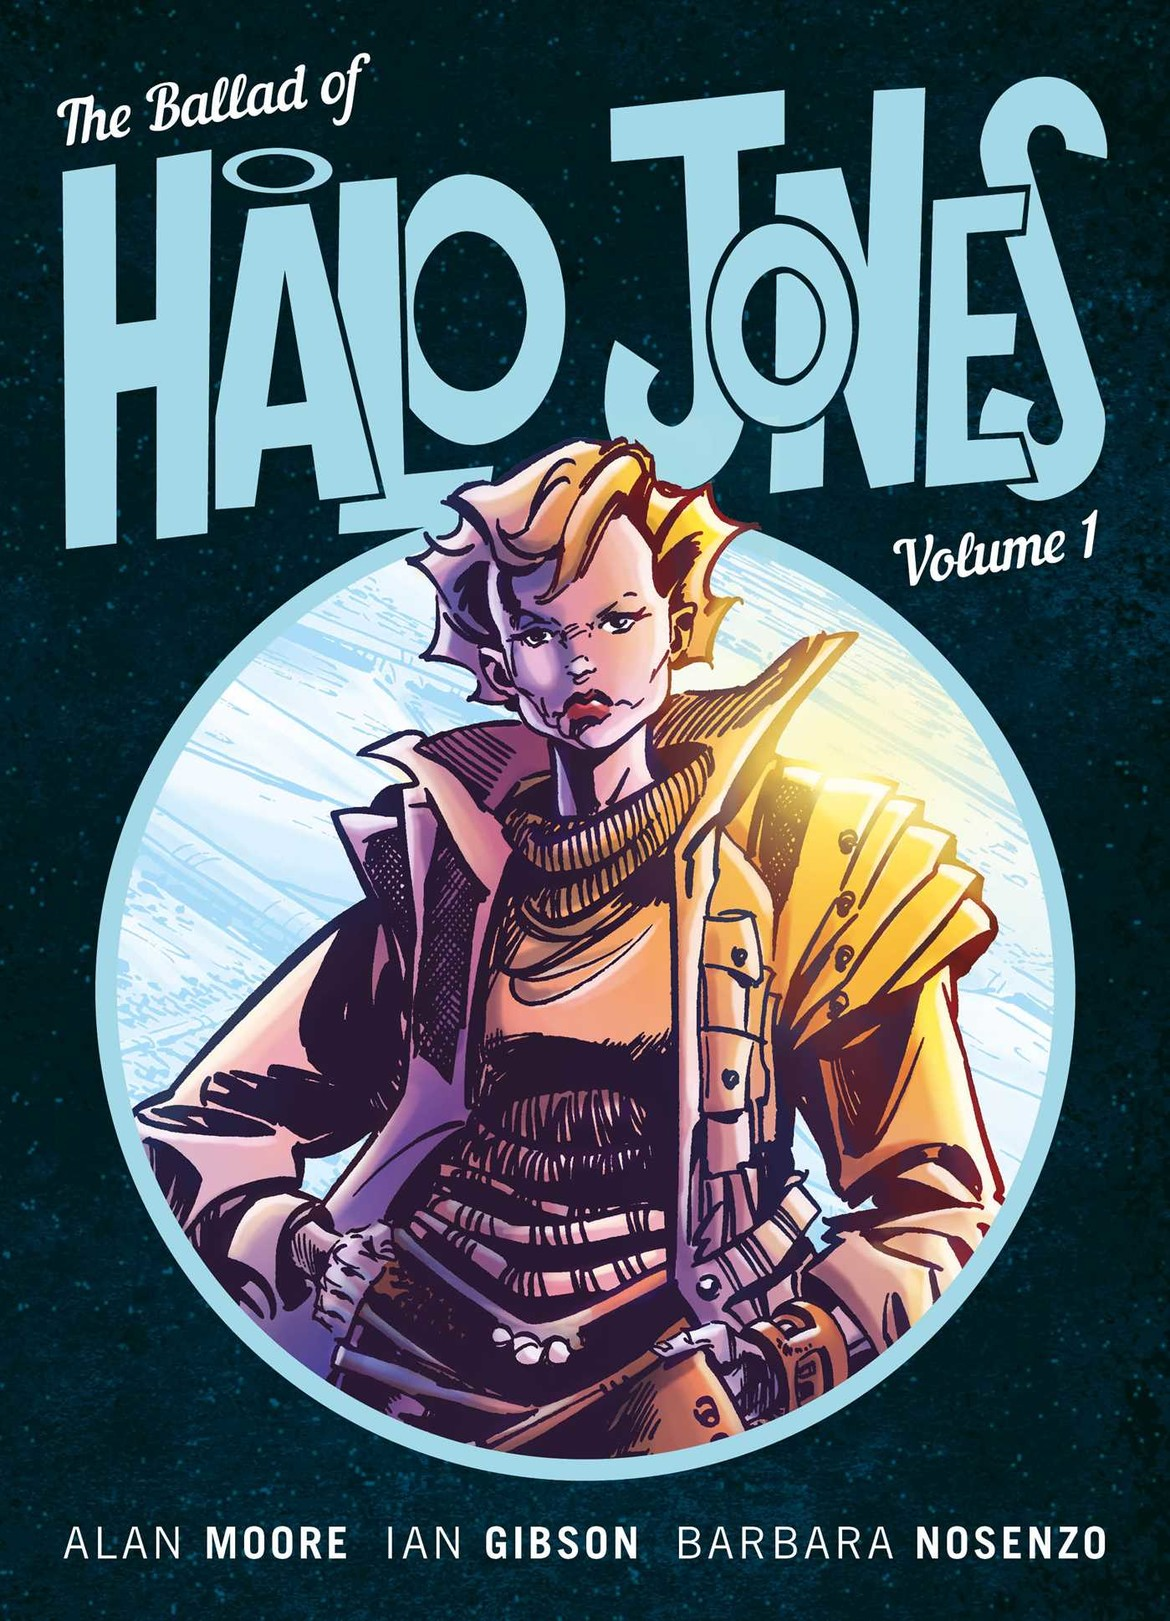 The Ballad of Halo Jones Volume 1, by Alan Moore and Ian Gibson